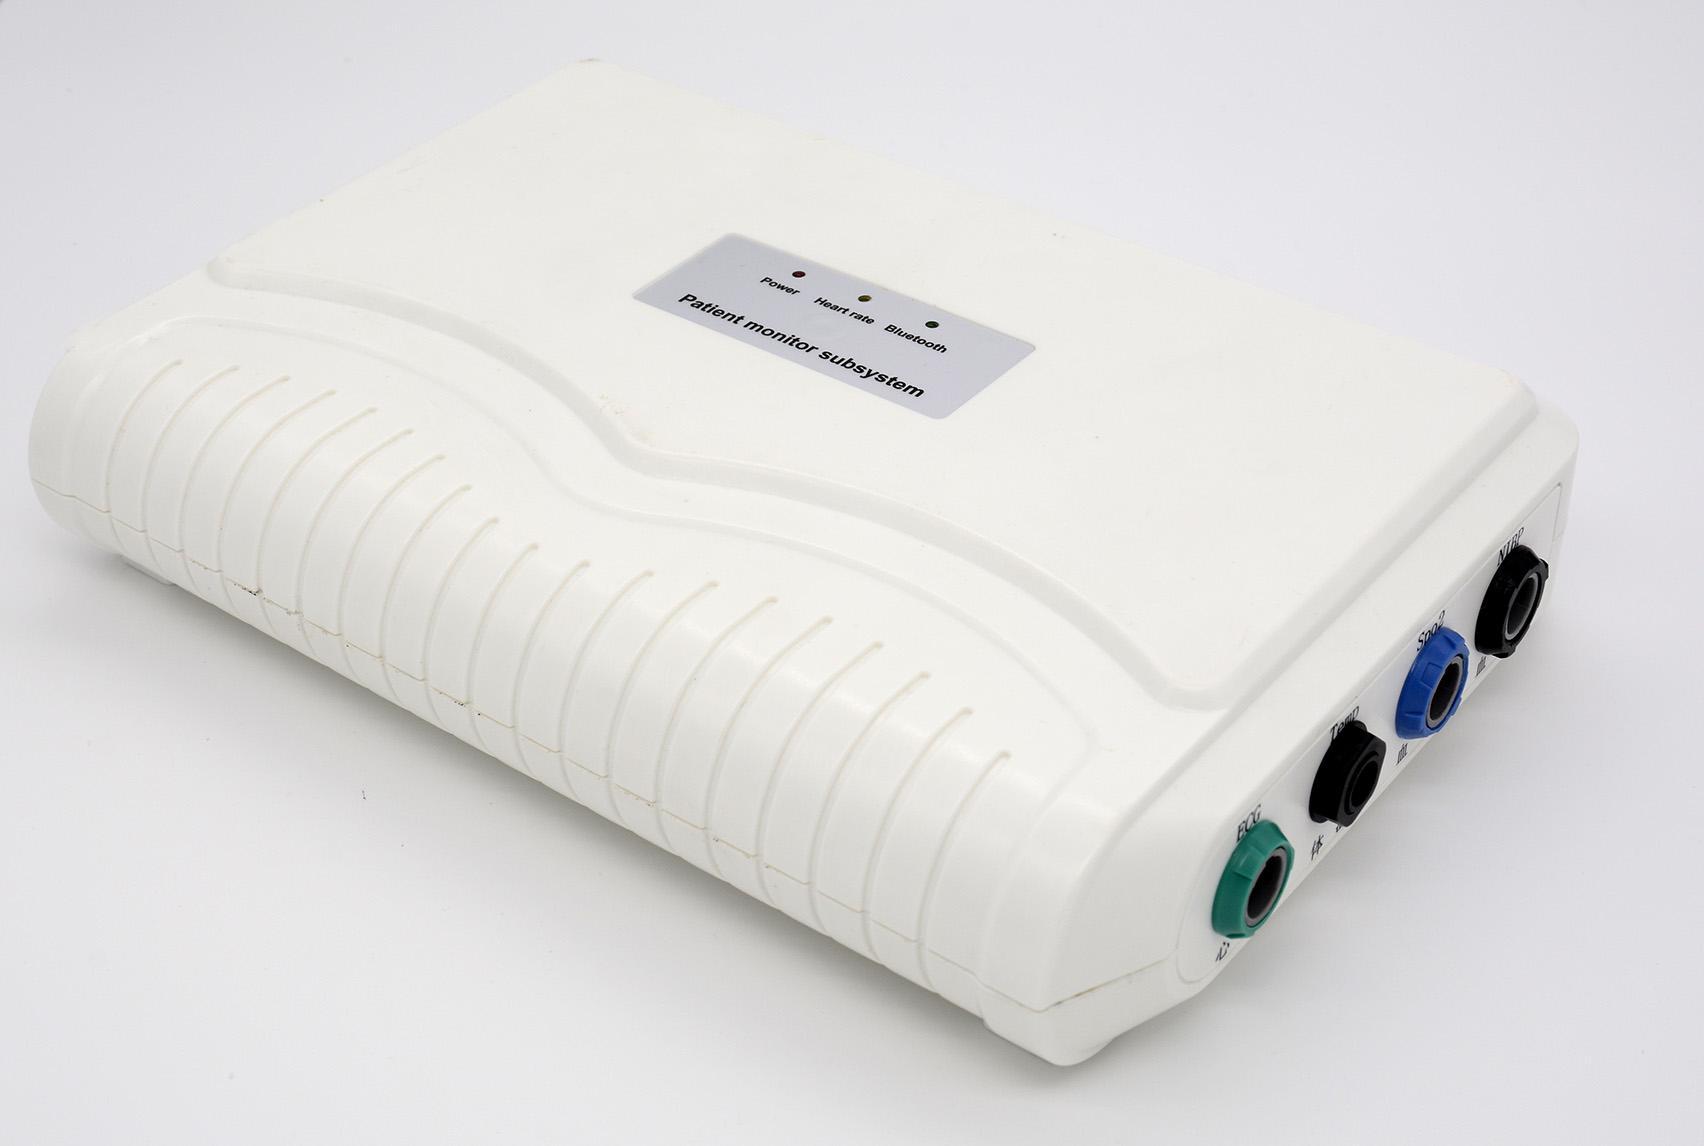 CE ISO认证的7英寸便携式生命体征监护仪 1